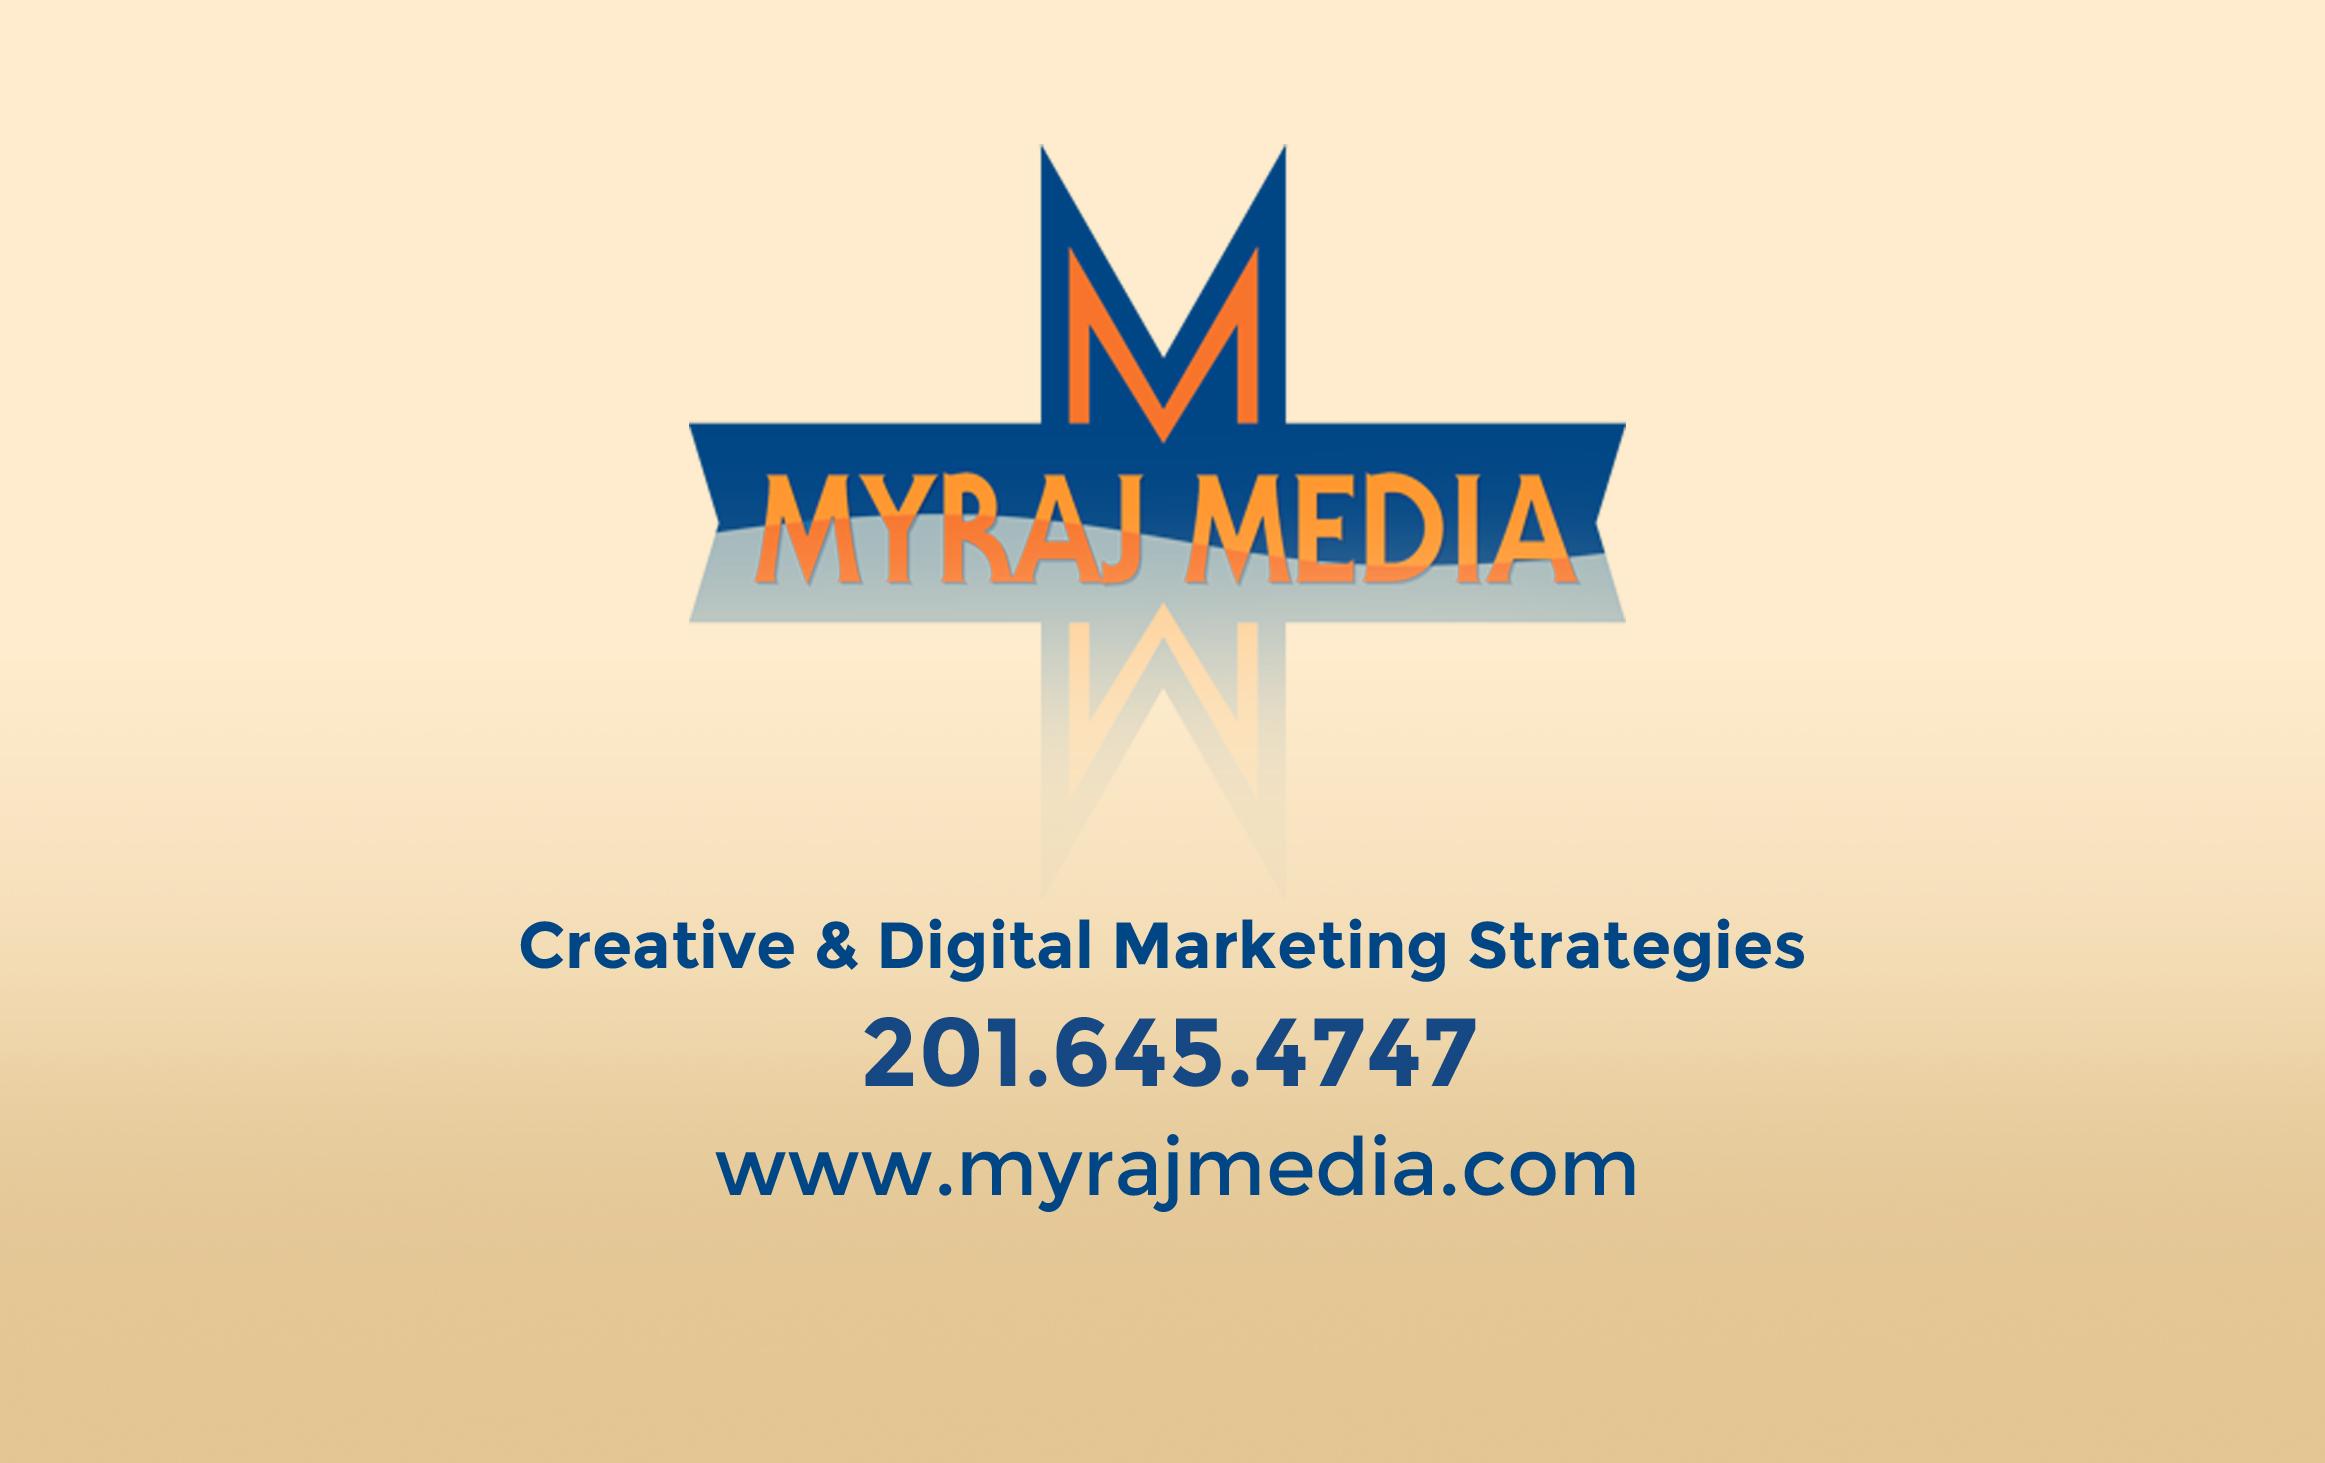 Myraj Media Business Cards